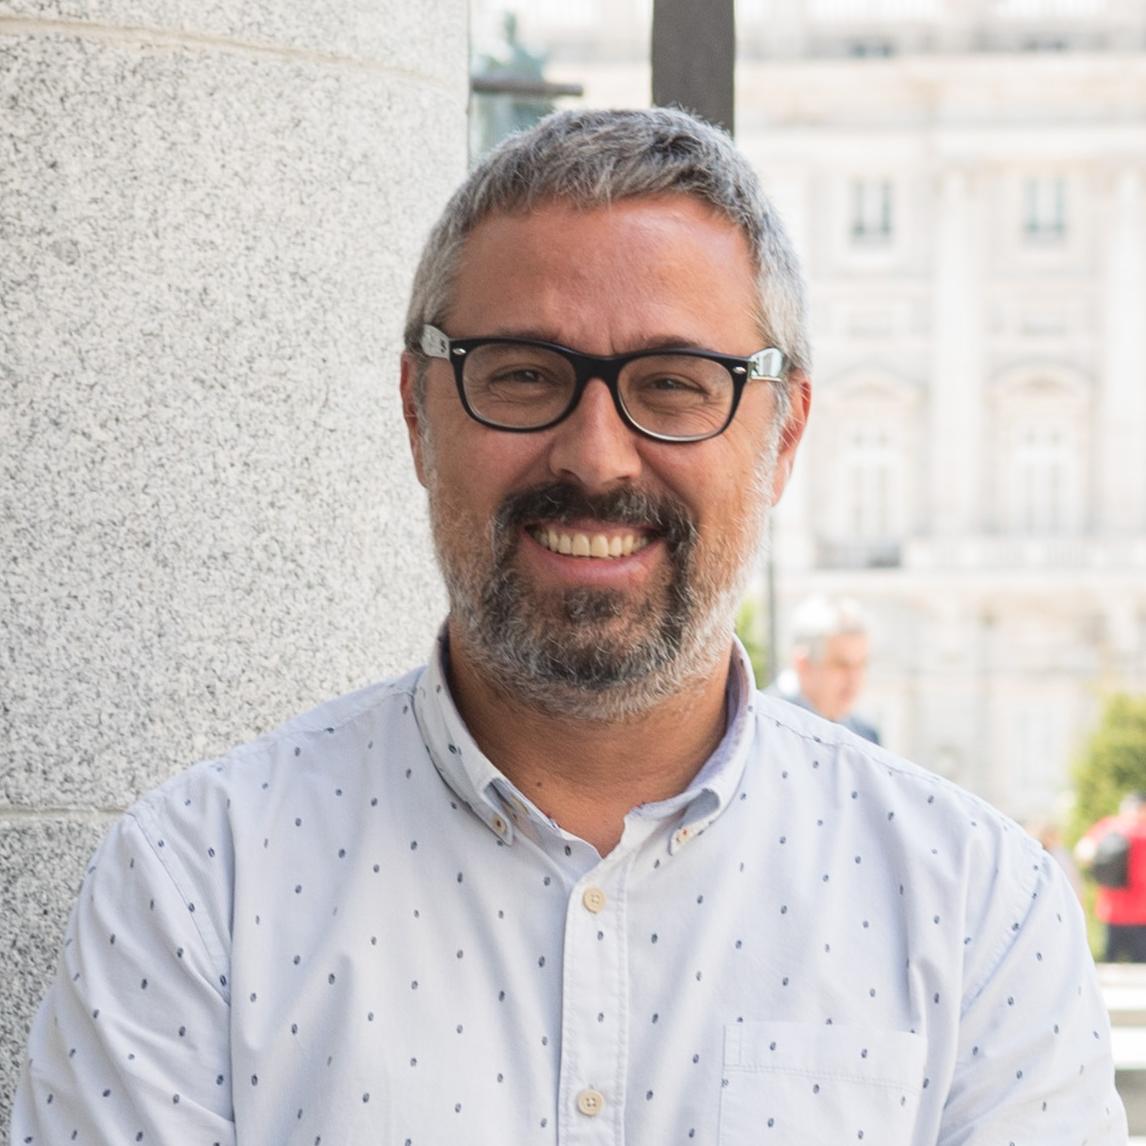 Profesor de clases de español para extranjeros - Javier Rodríguez